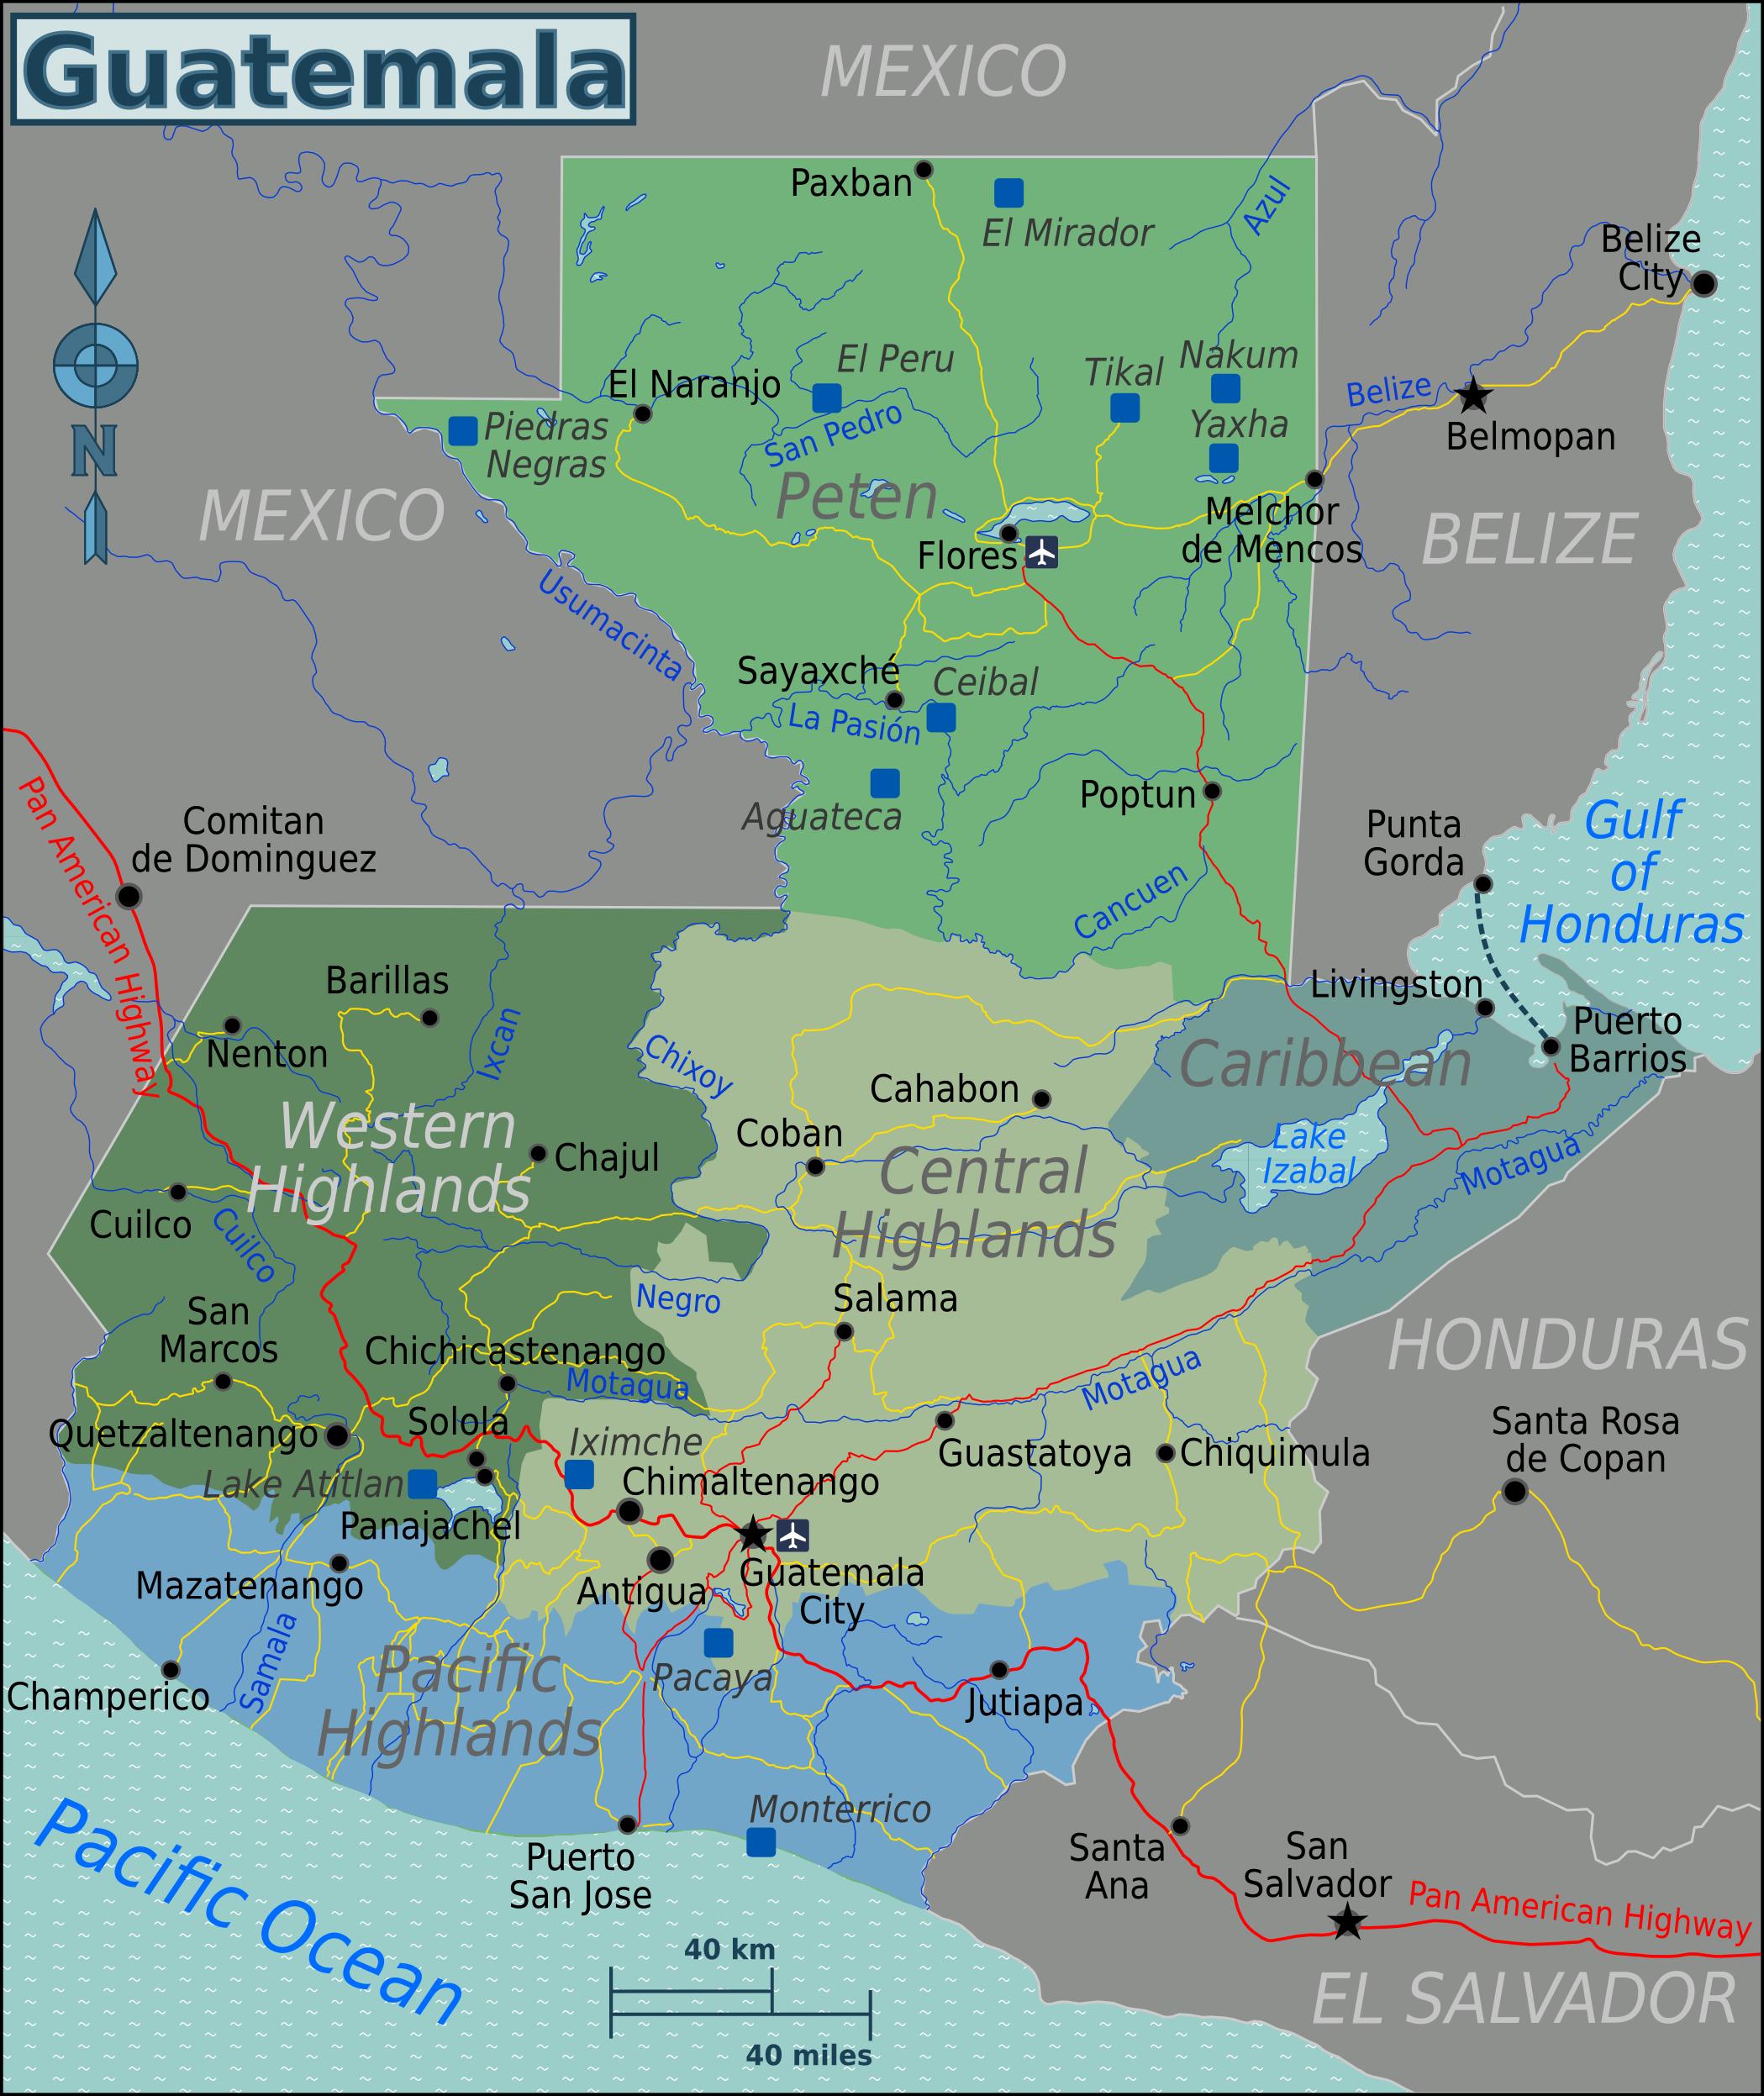 File:Guatemala Regions map.png - Wikimedia Commons